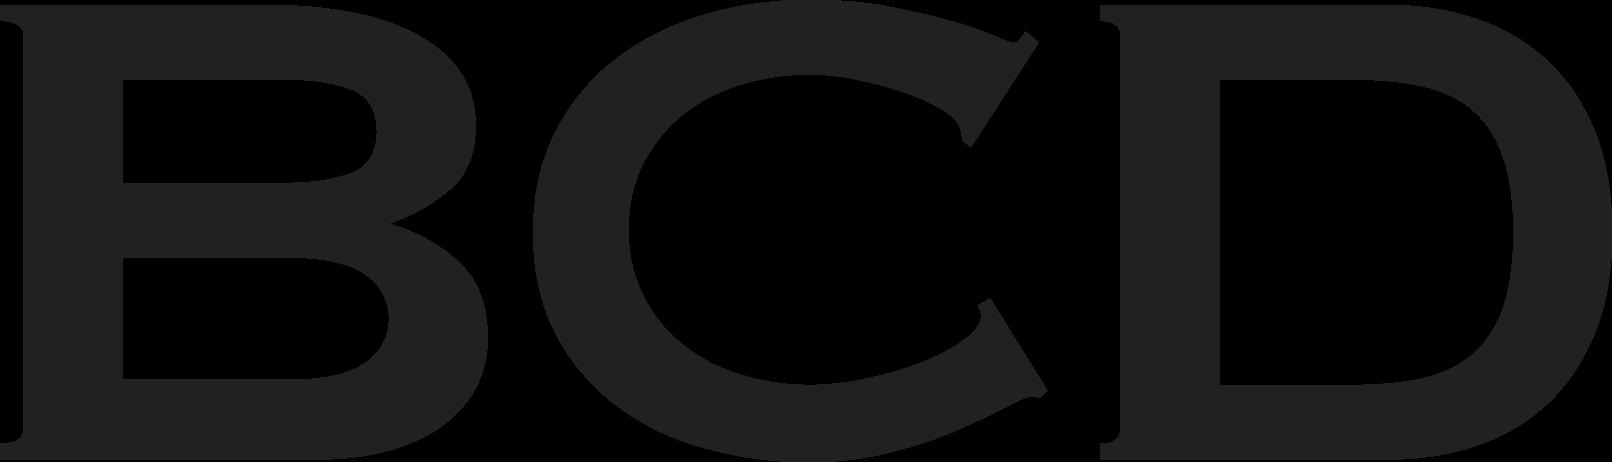 BCDVideo (BCD International) Company Logo